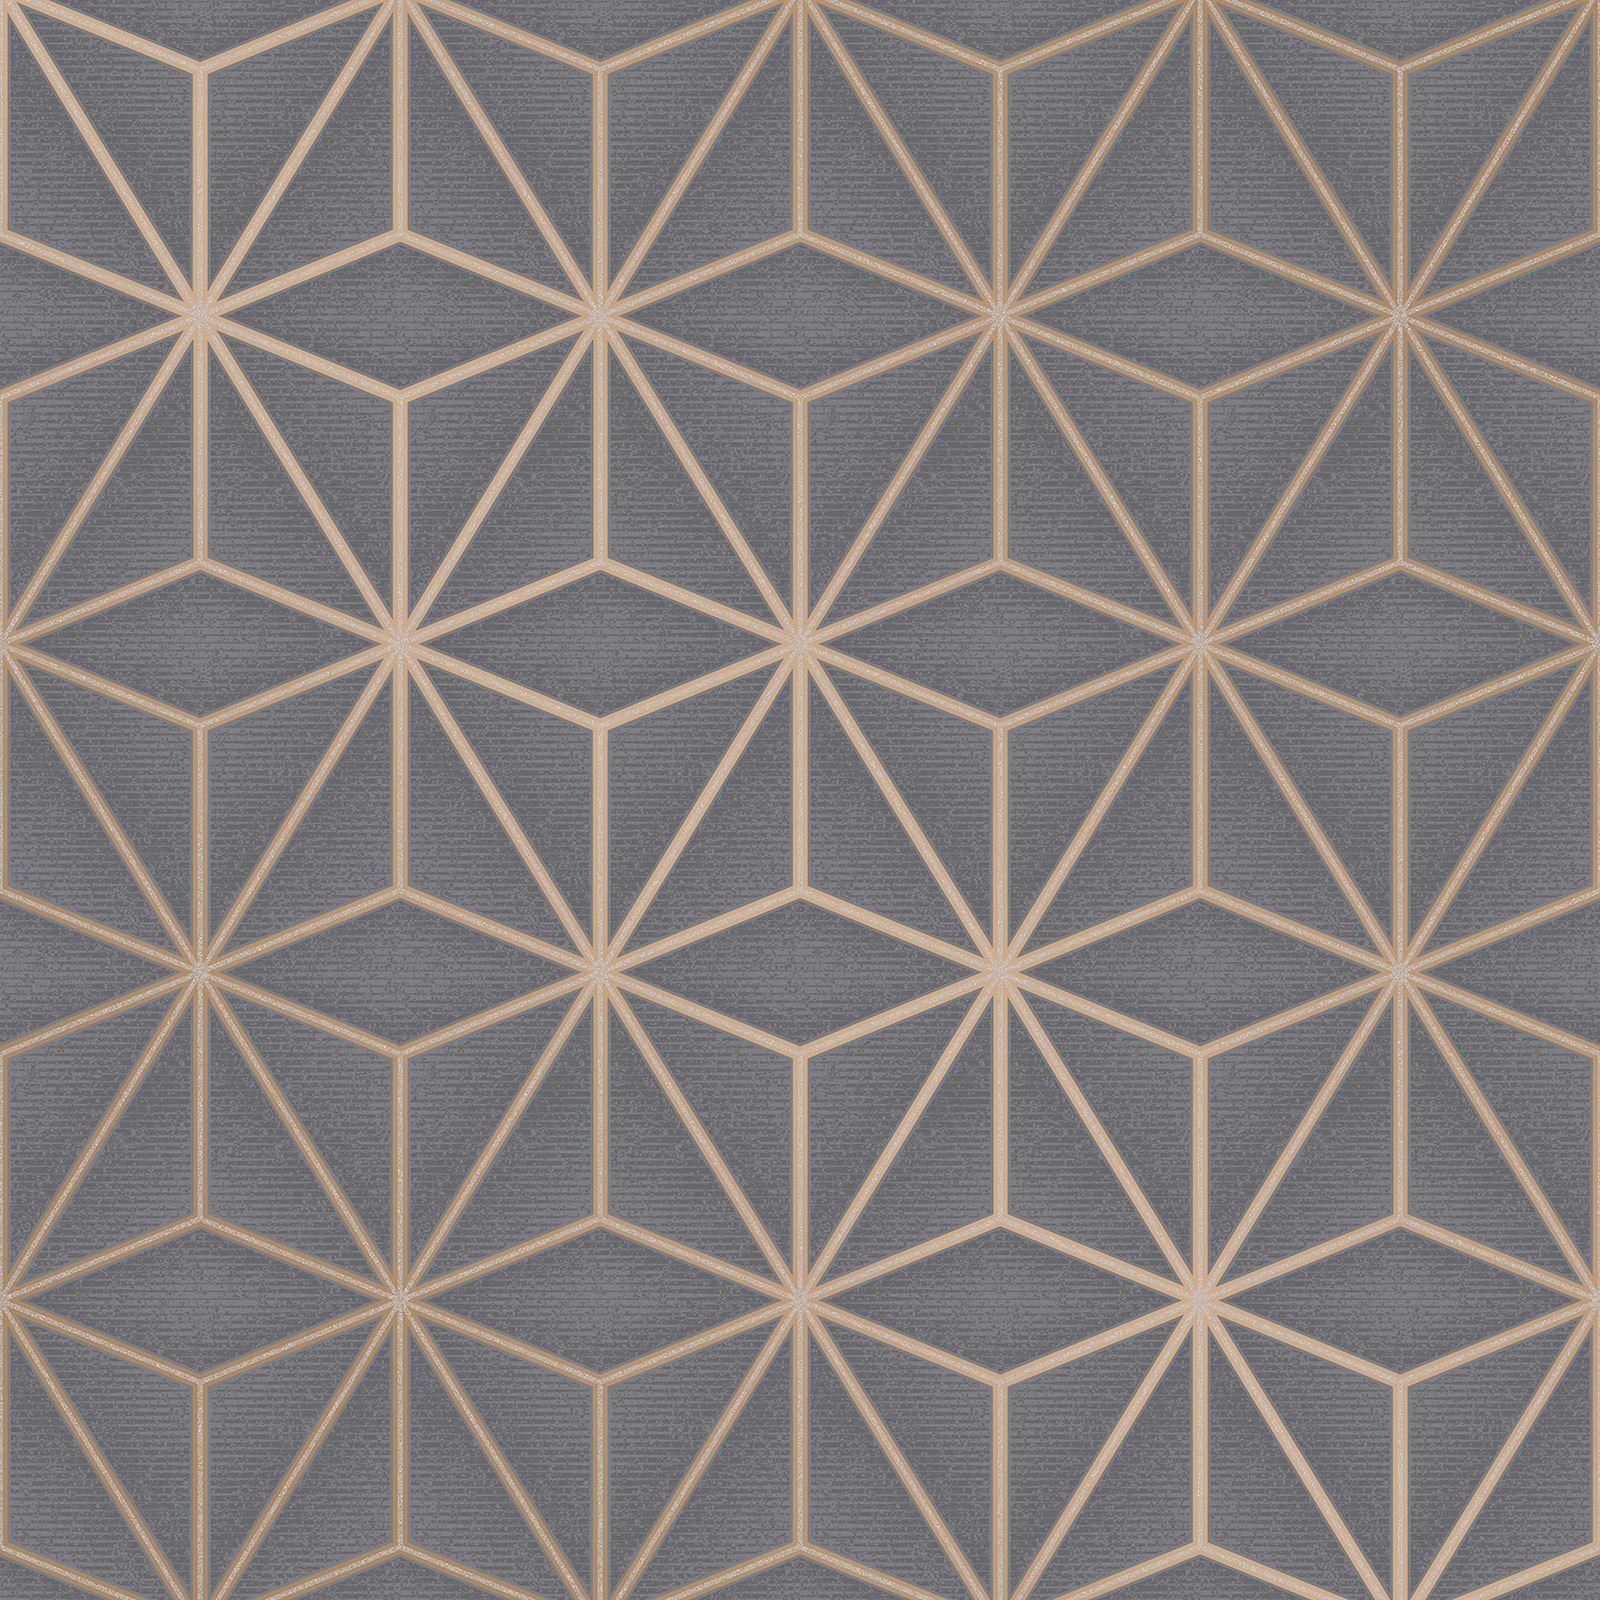 Apex Trellis Sidewall Wallpaper Copper: COPPER / CHARCOAL WALLPAPER - GLITTER METALLIC FEATHERS TREE DAMASK GEOMETRIC